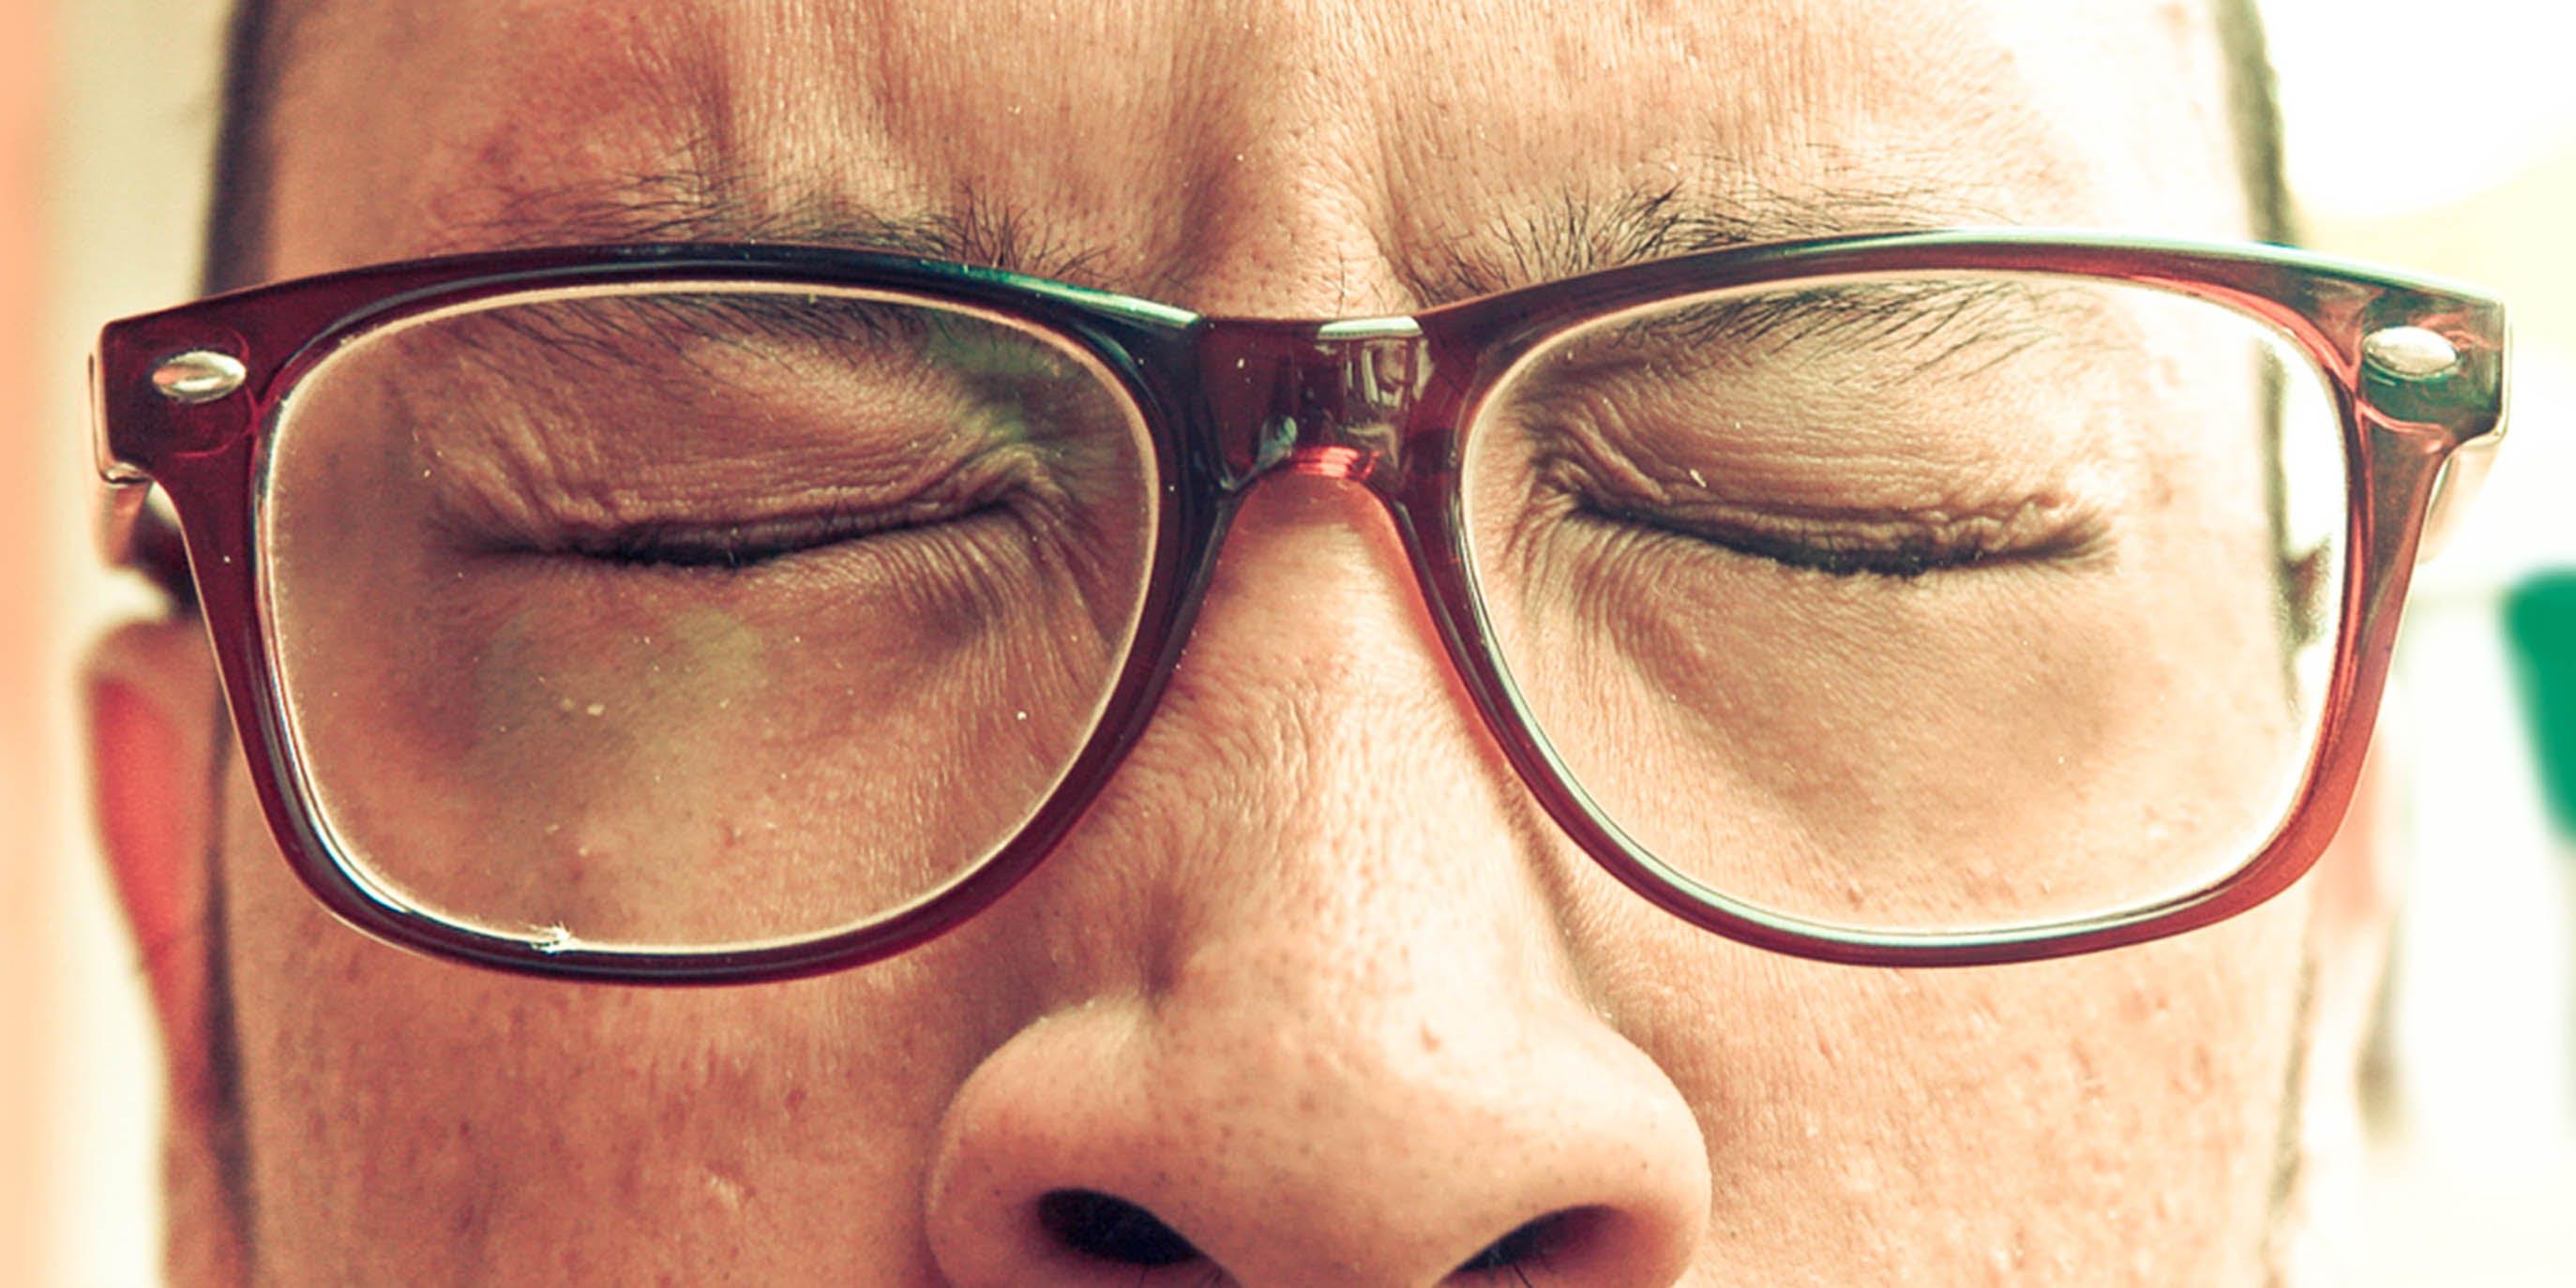 Does Cannabis Make You Forgetful? A Look At Cannabis Memory Loss